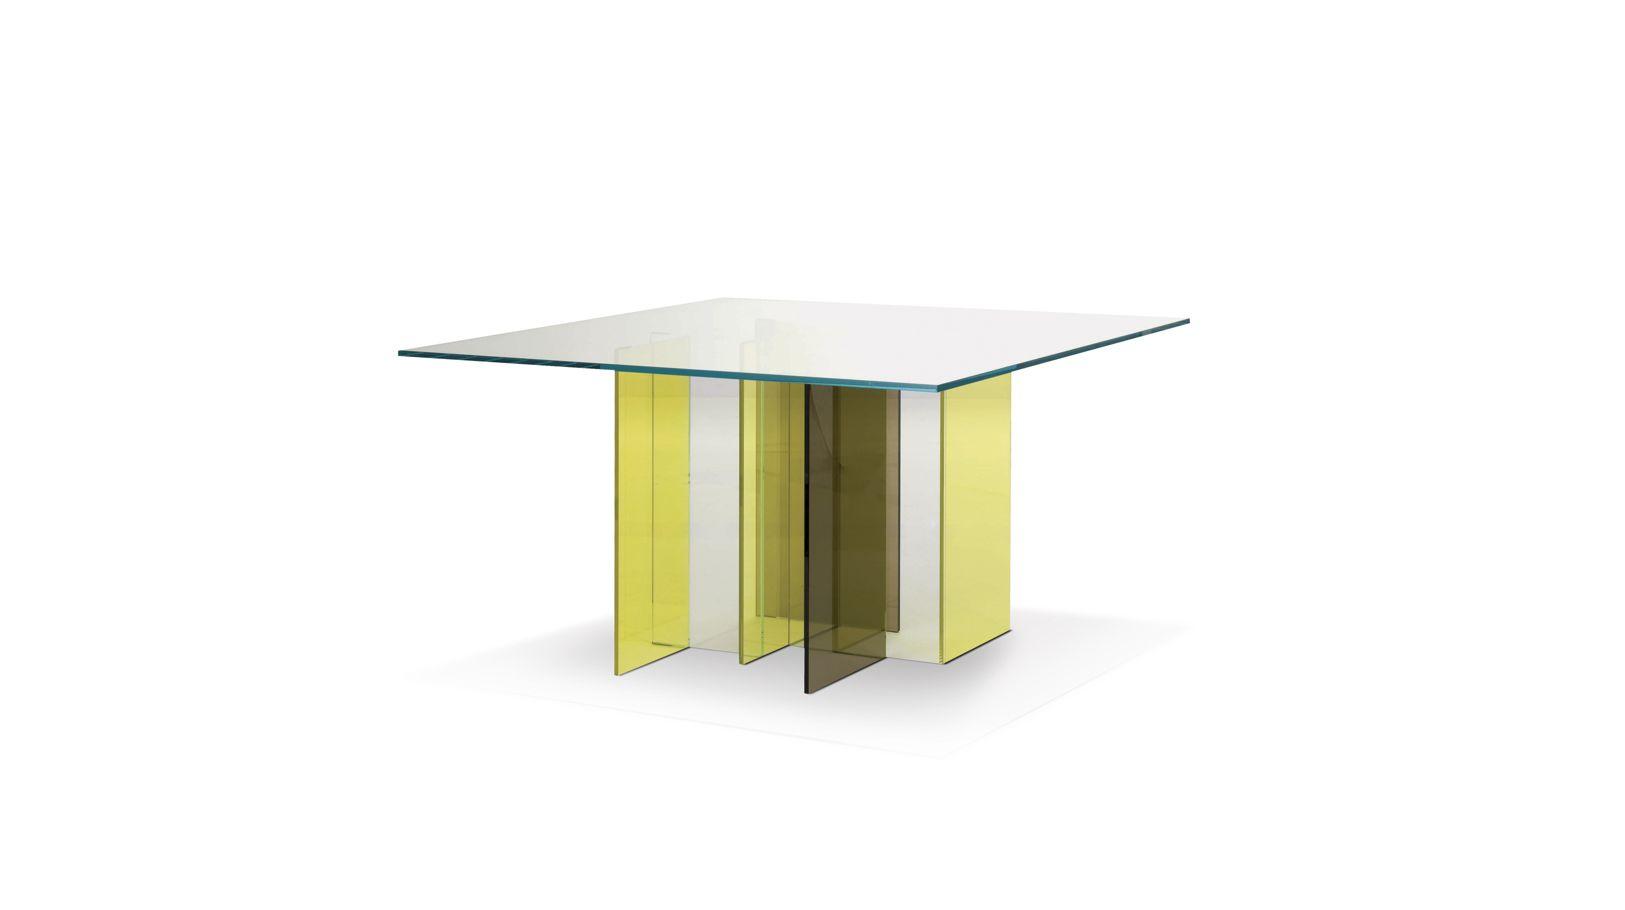 Diapo cocktail table roche bobois - Tables de chevet roche bobois ...